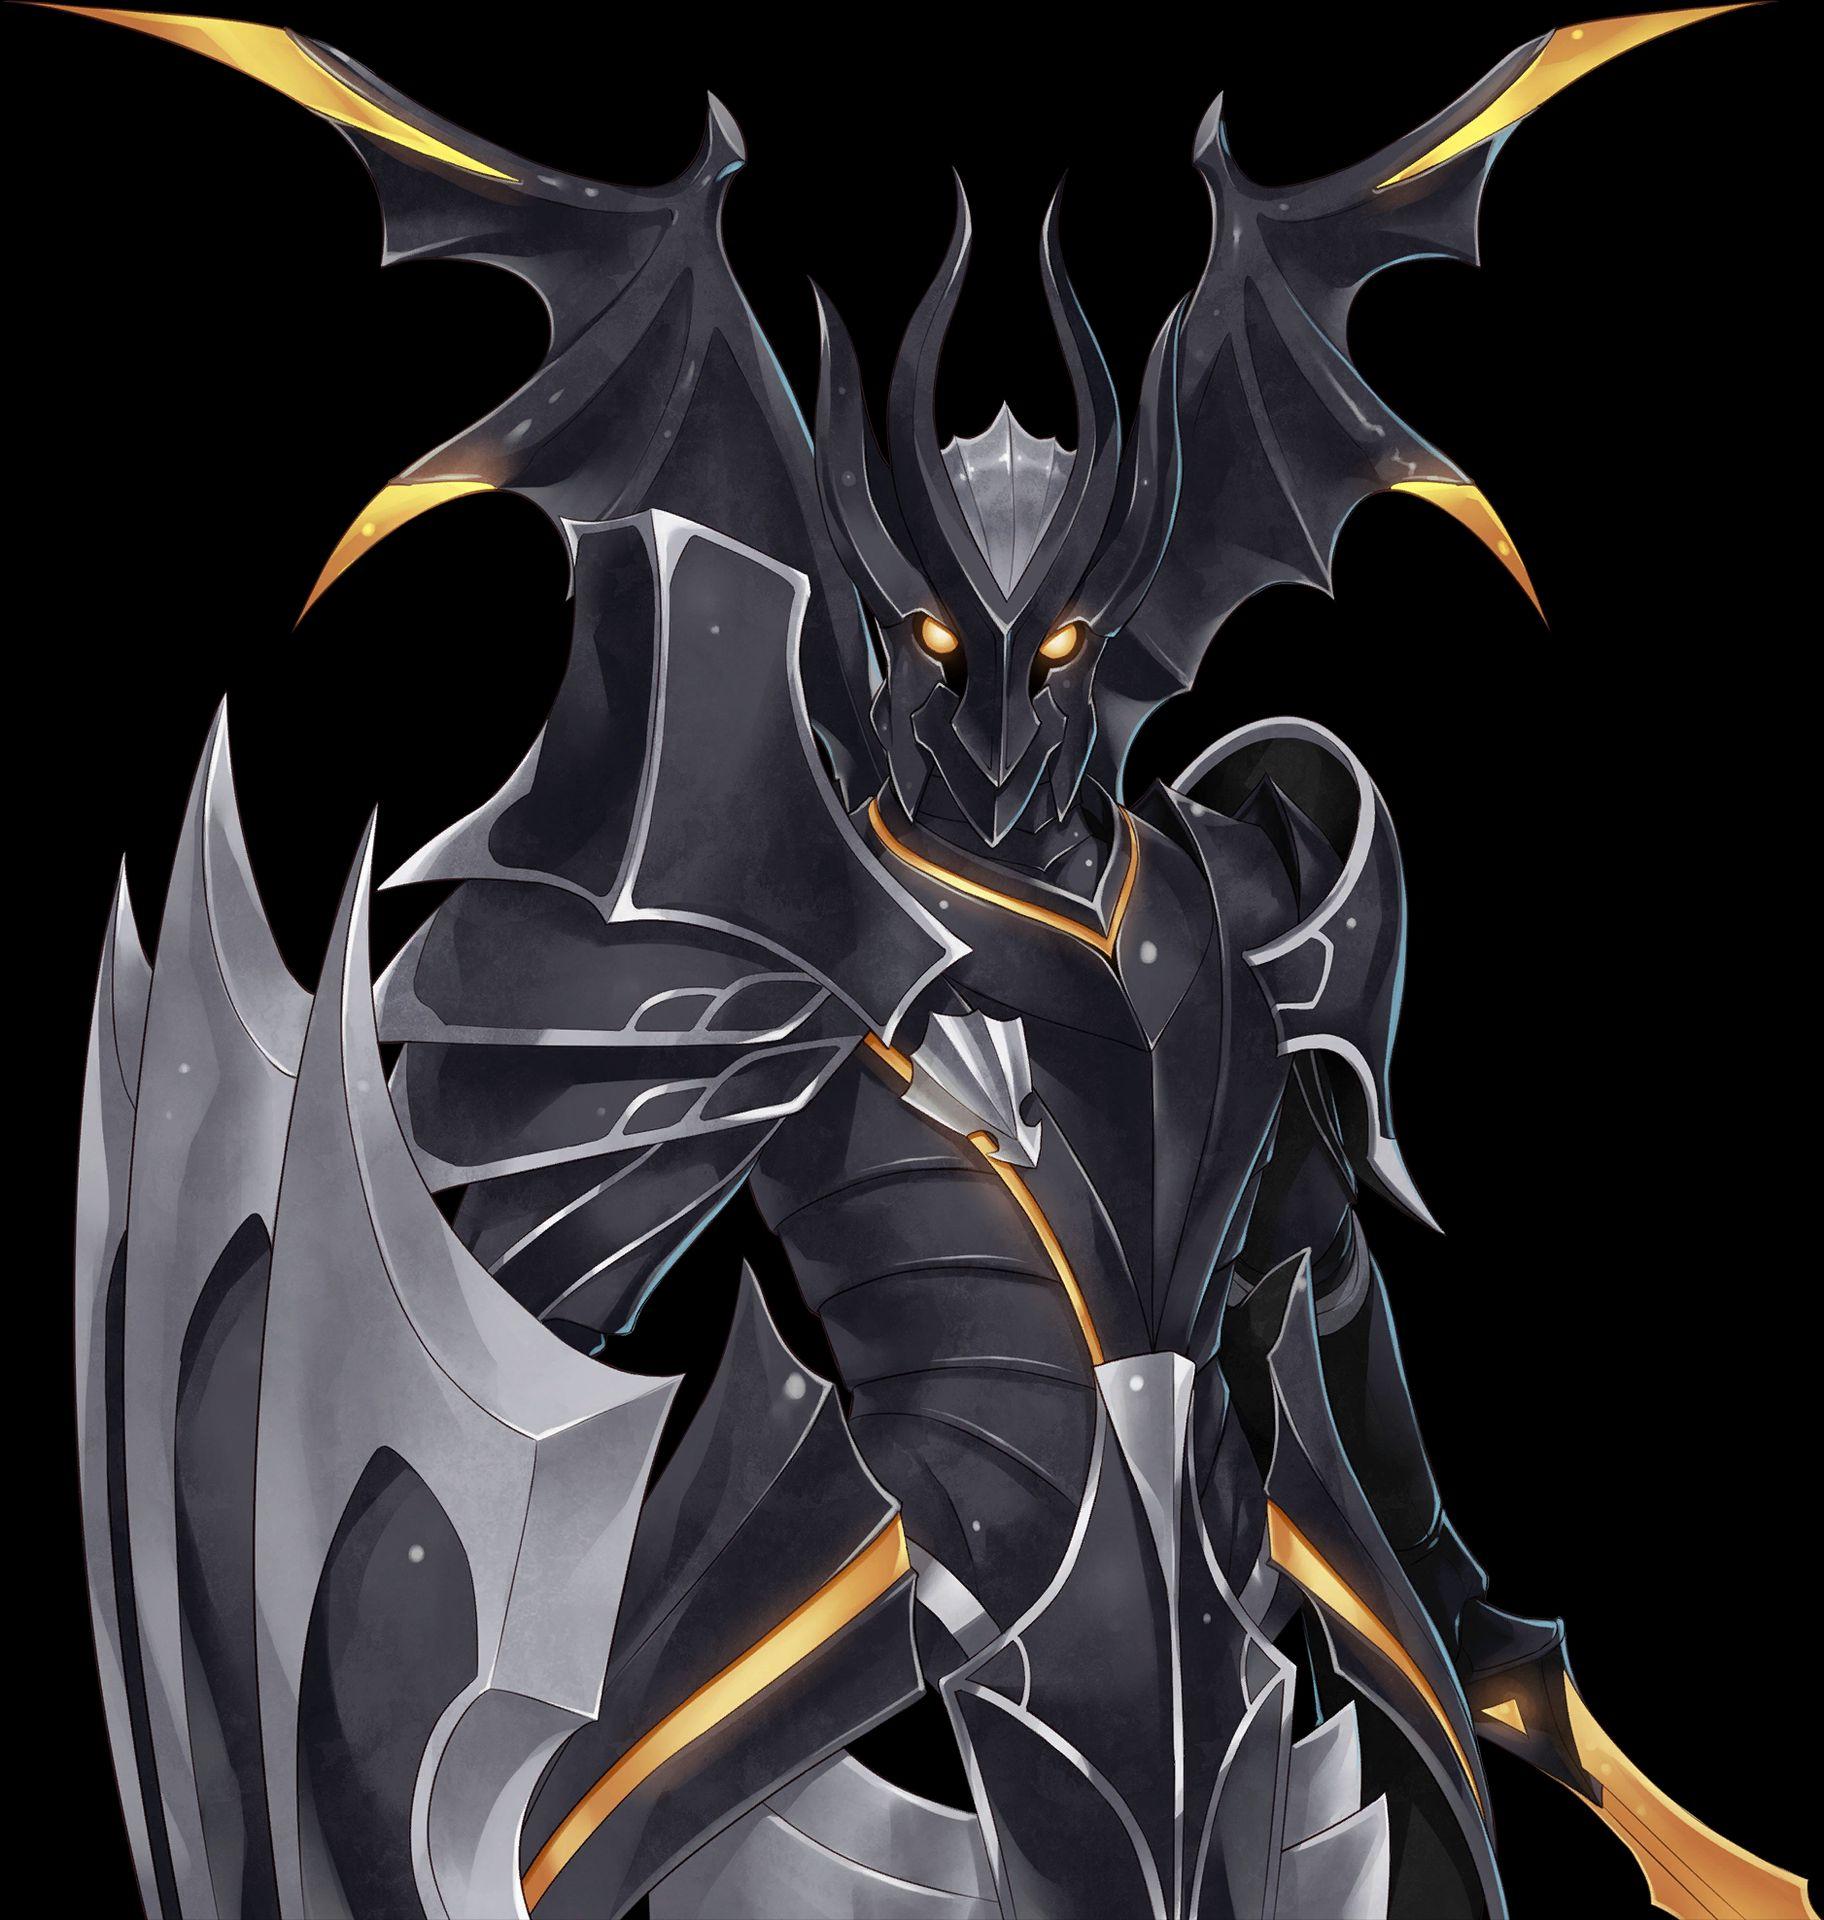 hyperdimension neptunia re birth2 sisters generation old dragon horn